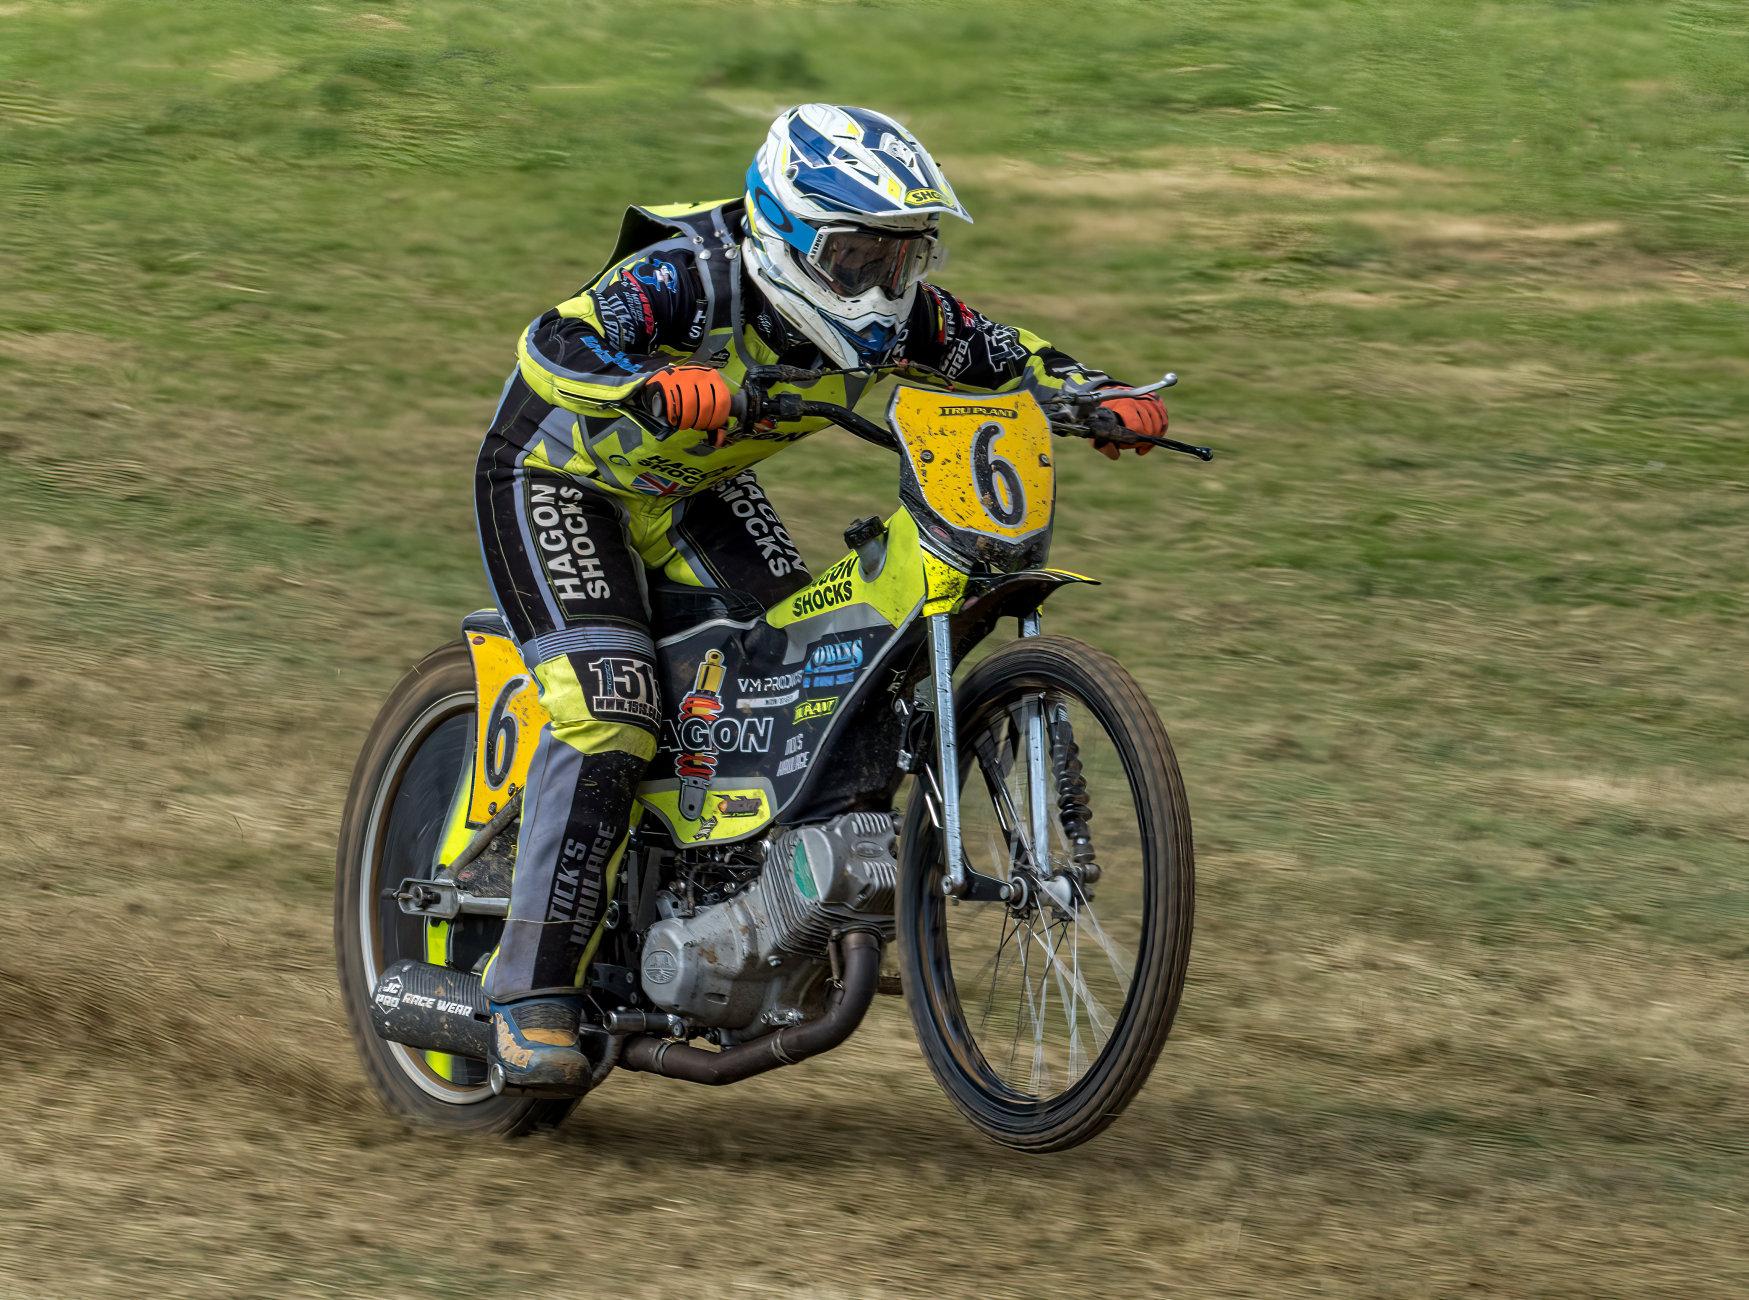 Grass Track Racing.